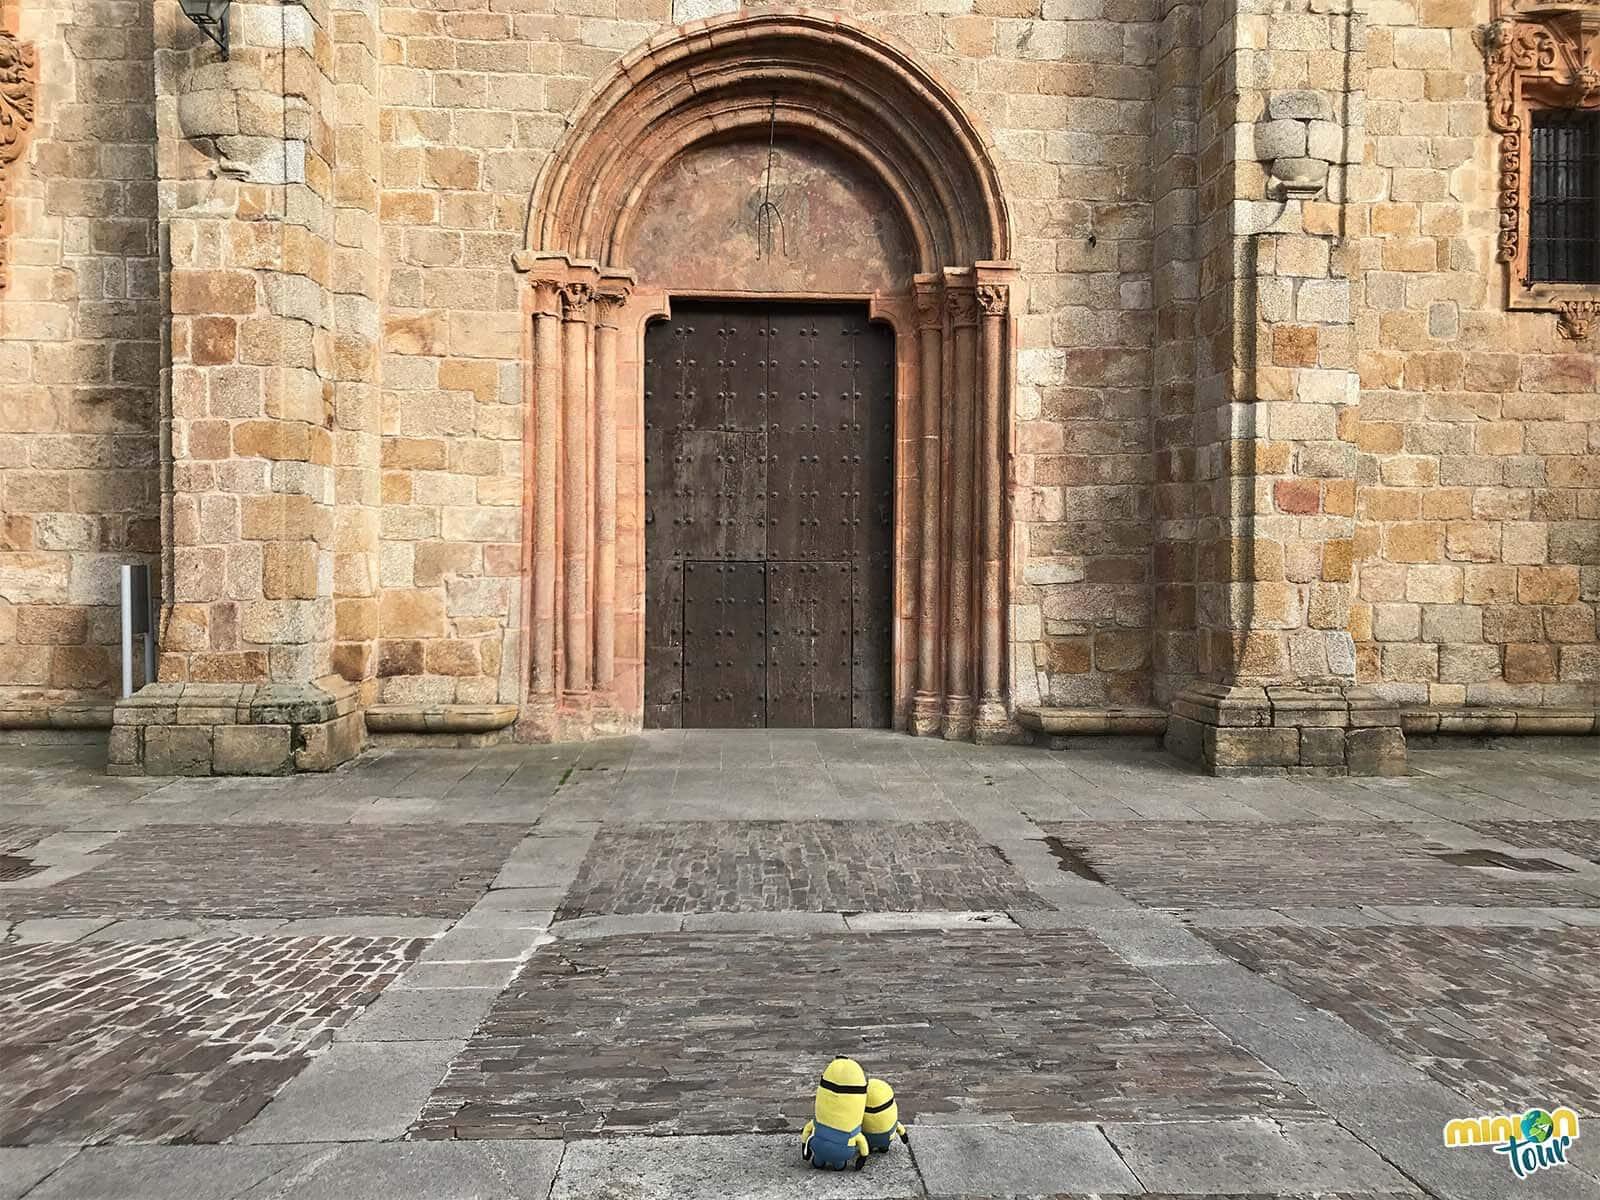 La portada de la Catedral de Mondoñedo es románica